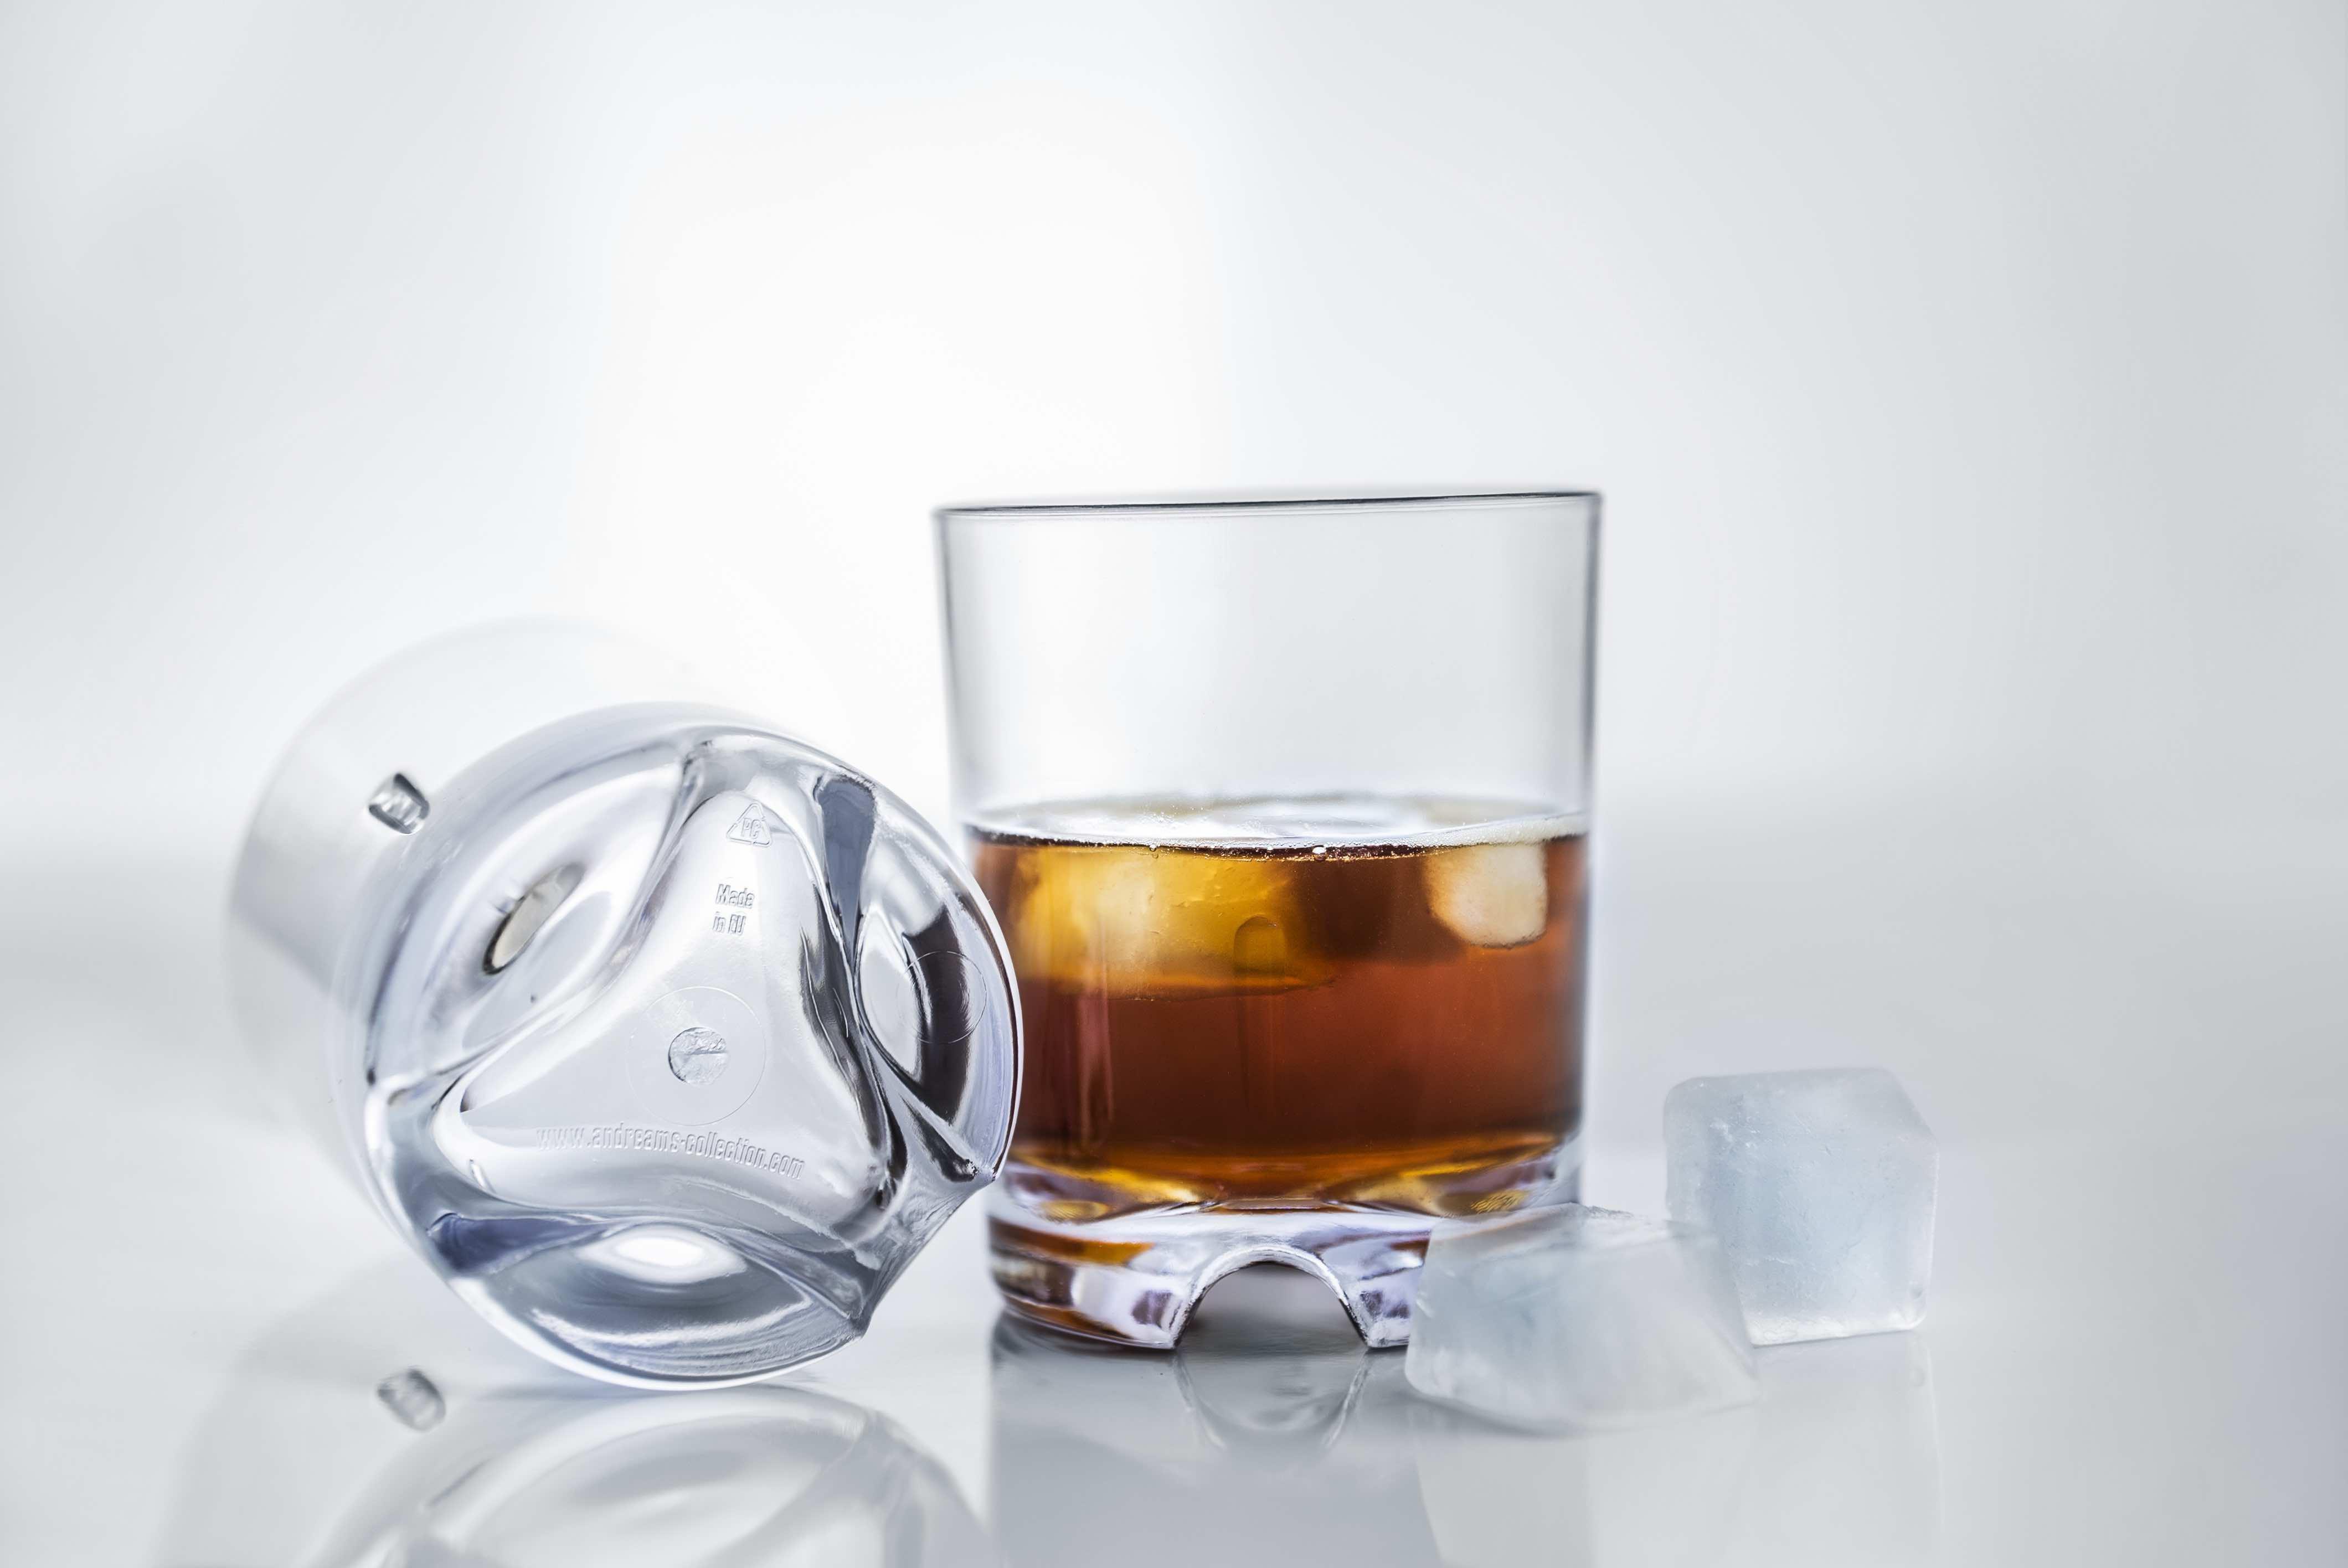 műanyag whiskey pohár